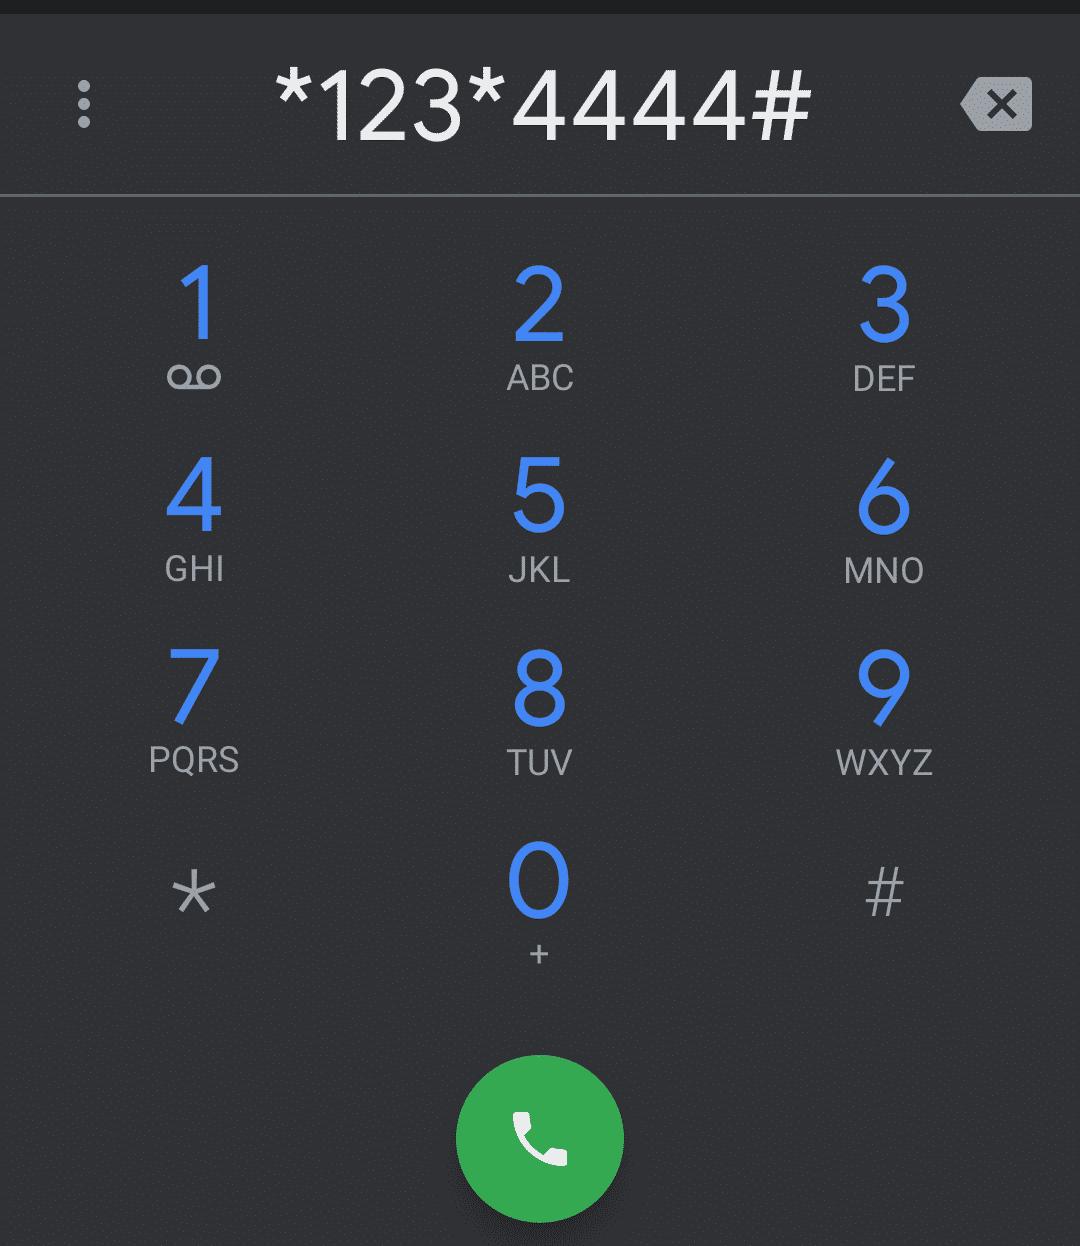 Setelah-itu-ketik-kode-dial-up-123-444